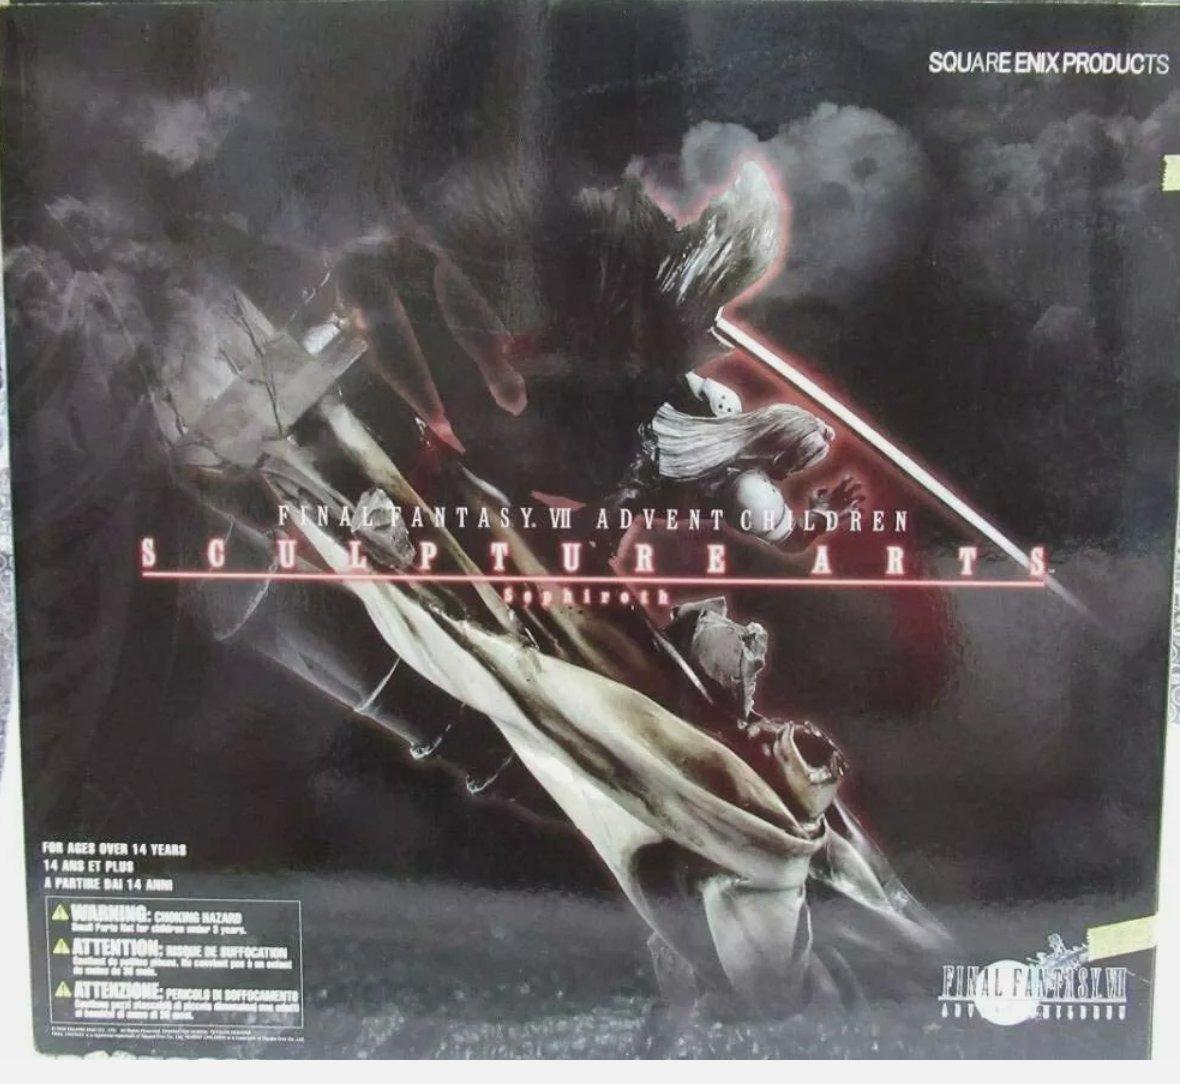 """Looking for the box for the Final Fantasy VII Advent Children Sculpture Arts statue of Cloud"" #FFvii #FFVIIAdventchildren #Adventchildren #WTB #FinalFantasy #FinalFantasyvii #cloudstrife #ファイナルファンタジー #ファイナルファンタジーVII #クラウド・ストライフ #クラウドストライフ"